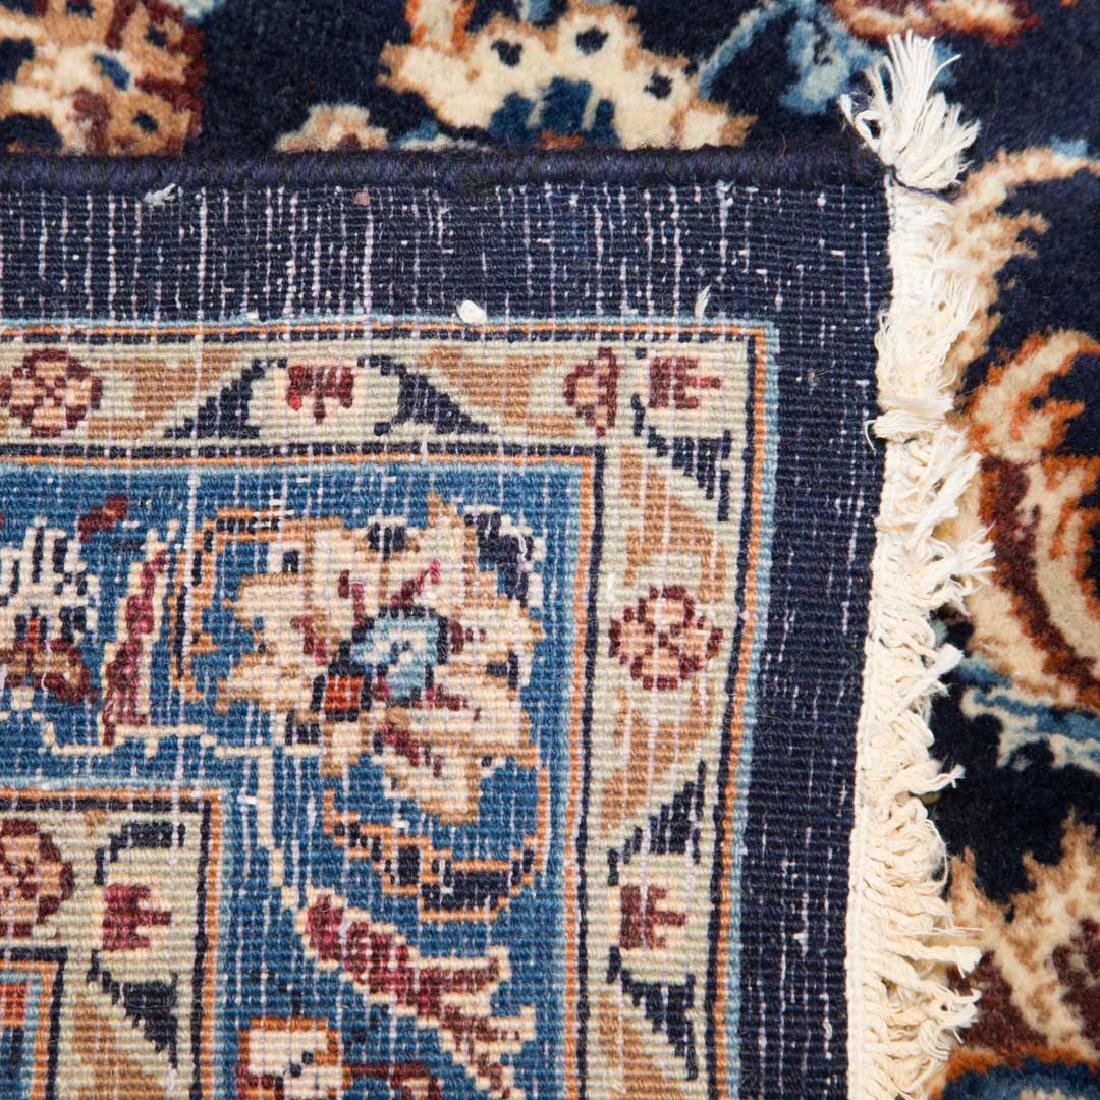 Persian Keshan carpet, approx. 9.8 x 12.3 - 3